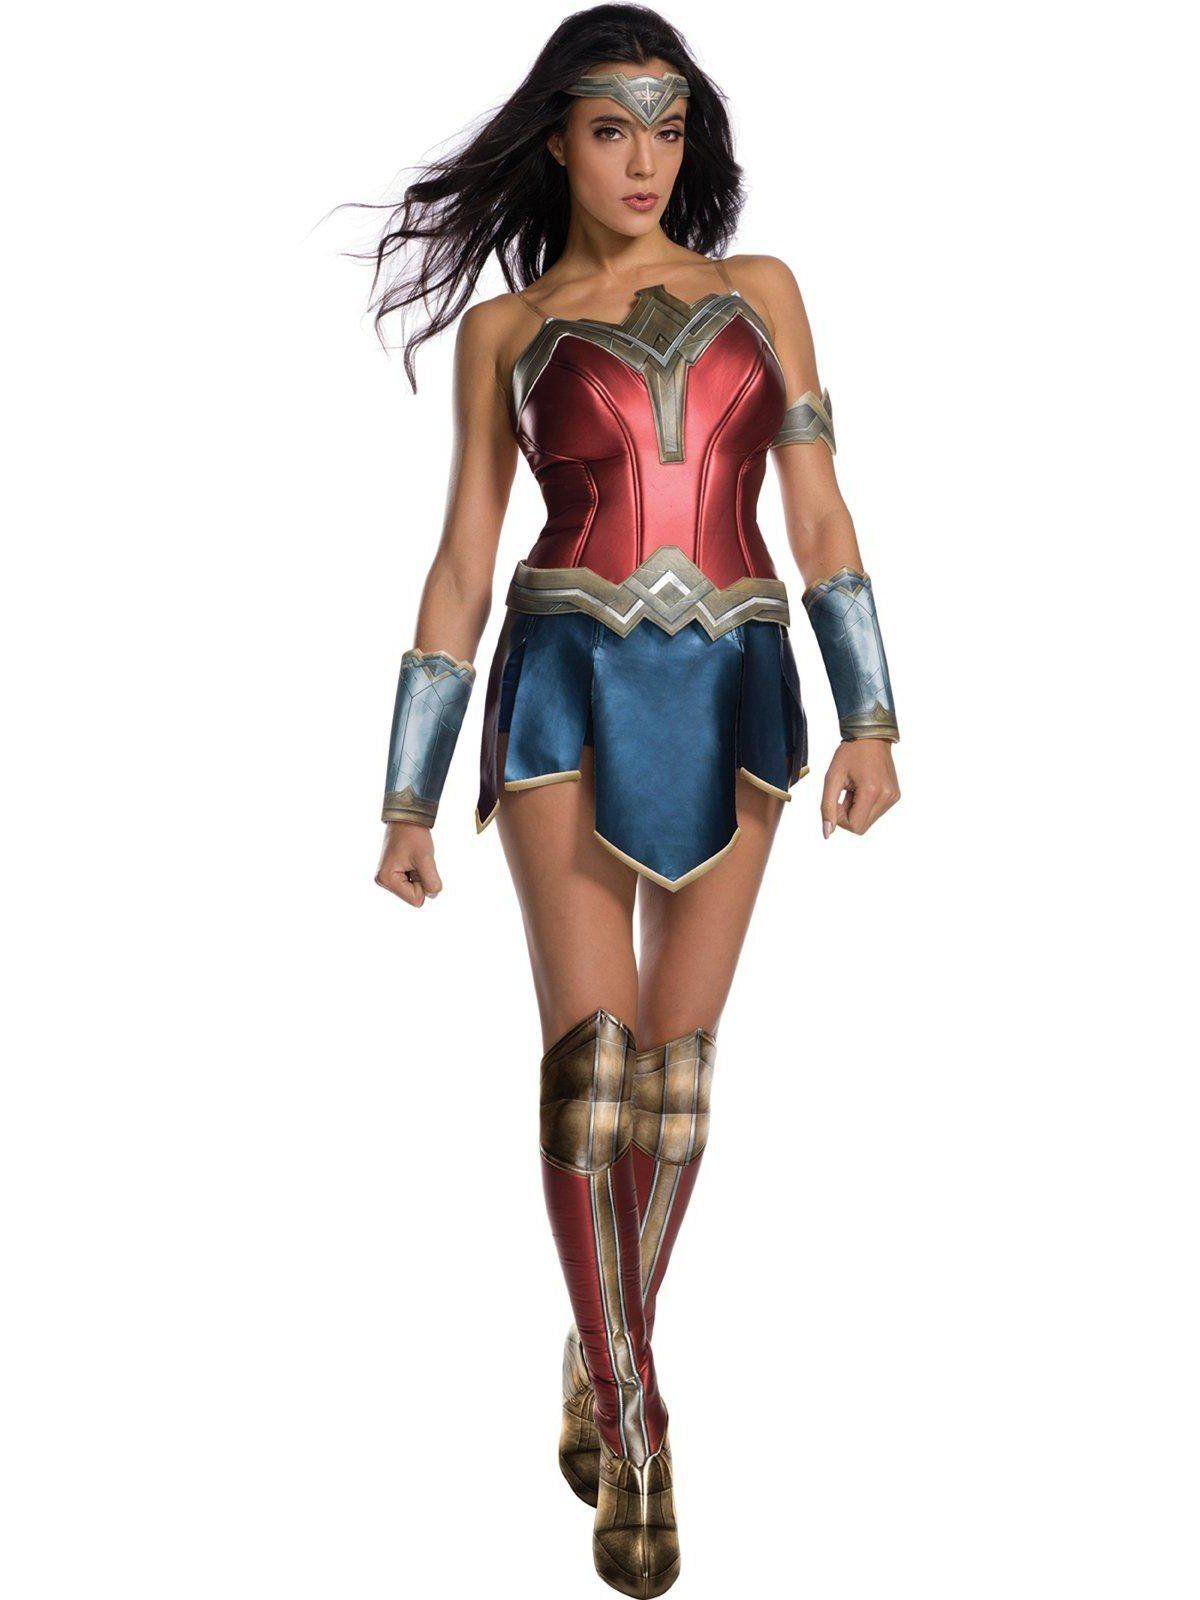 Fantasia Adulto Feminino Mulher Maravilha: Wonder Woman Movie (Apenas Venda Online)